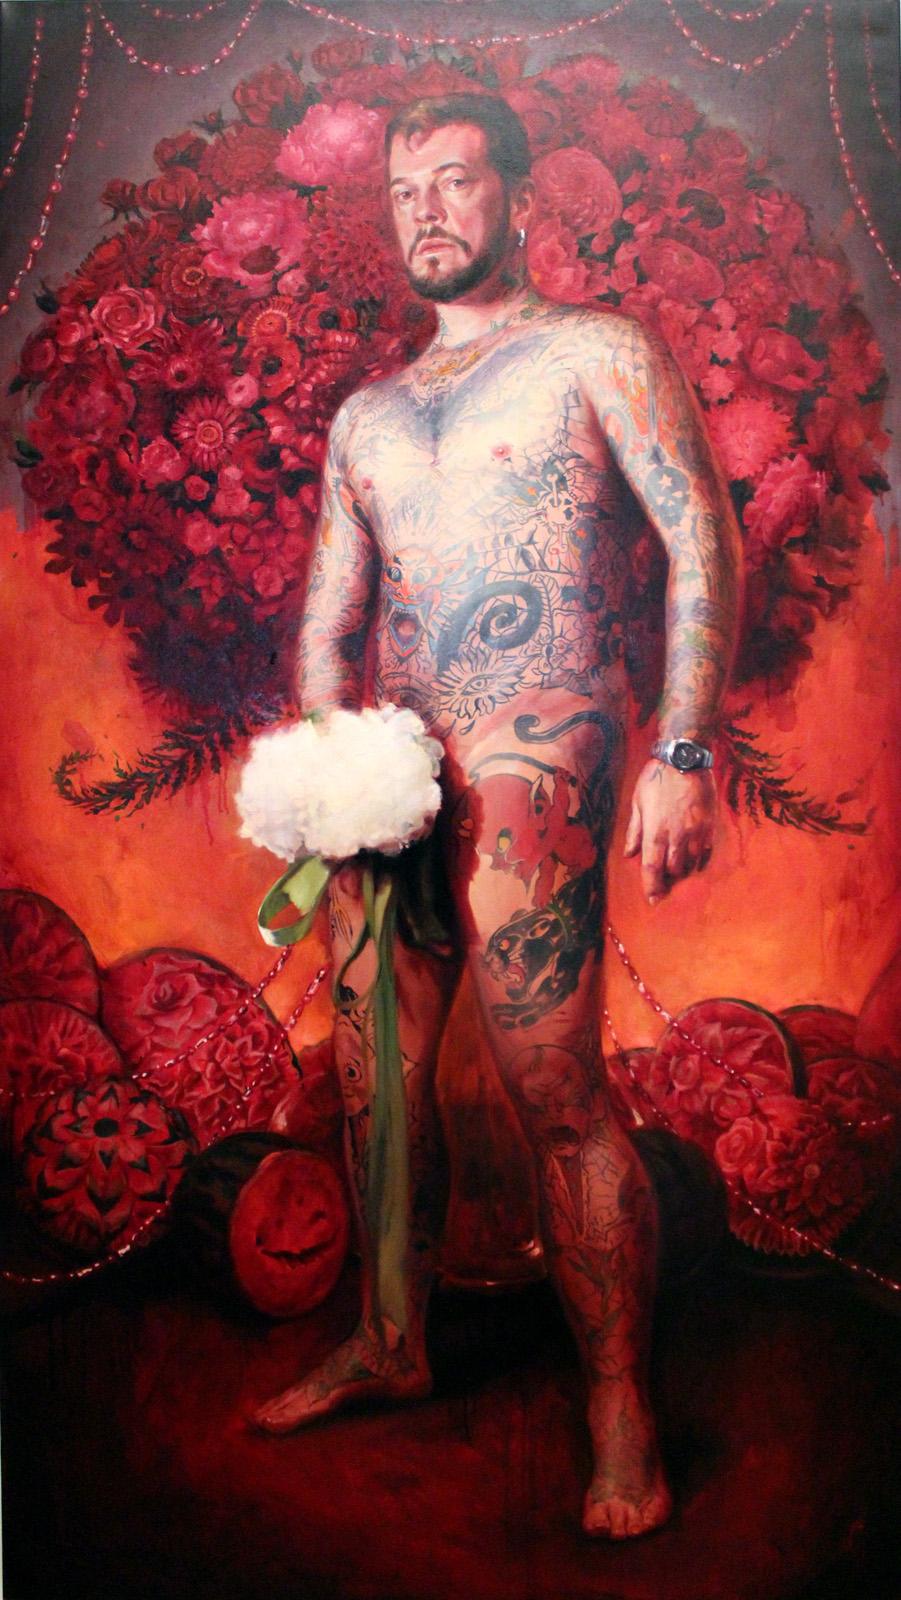 "'Portrait of the Artist, Thomas Woodruff', oil on canvas, 72"" x 40"", 2010"